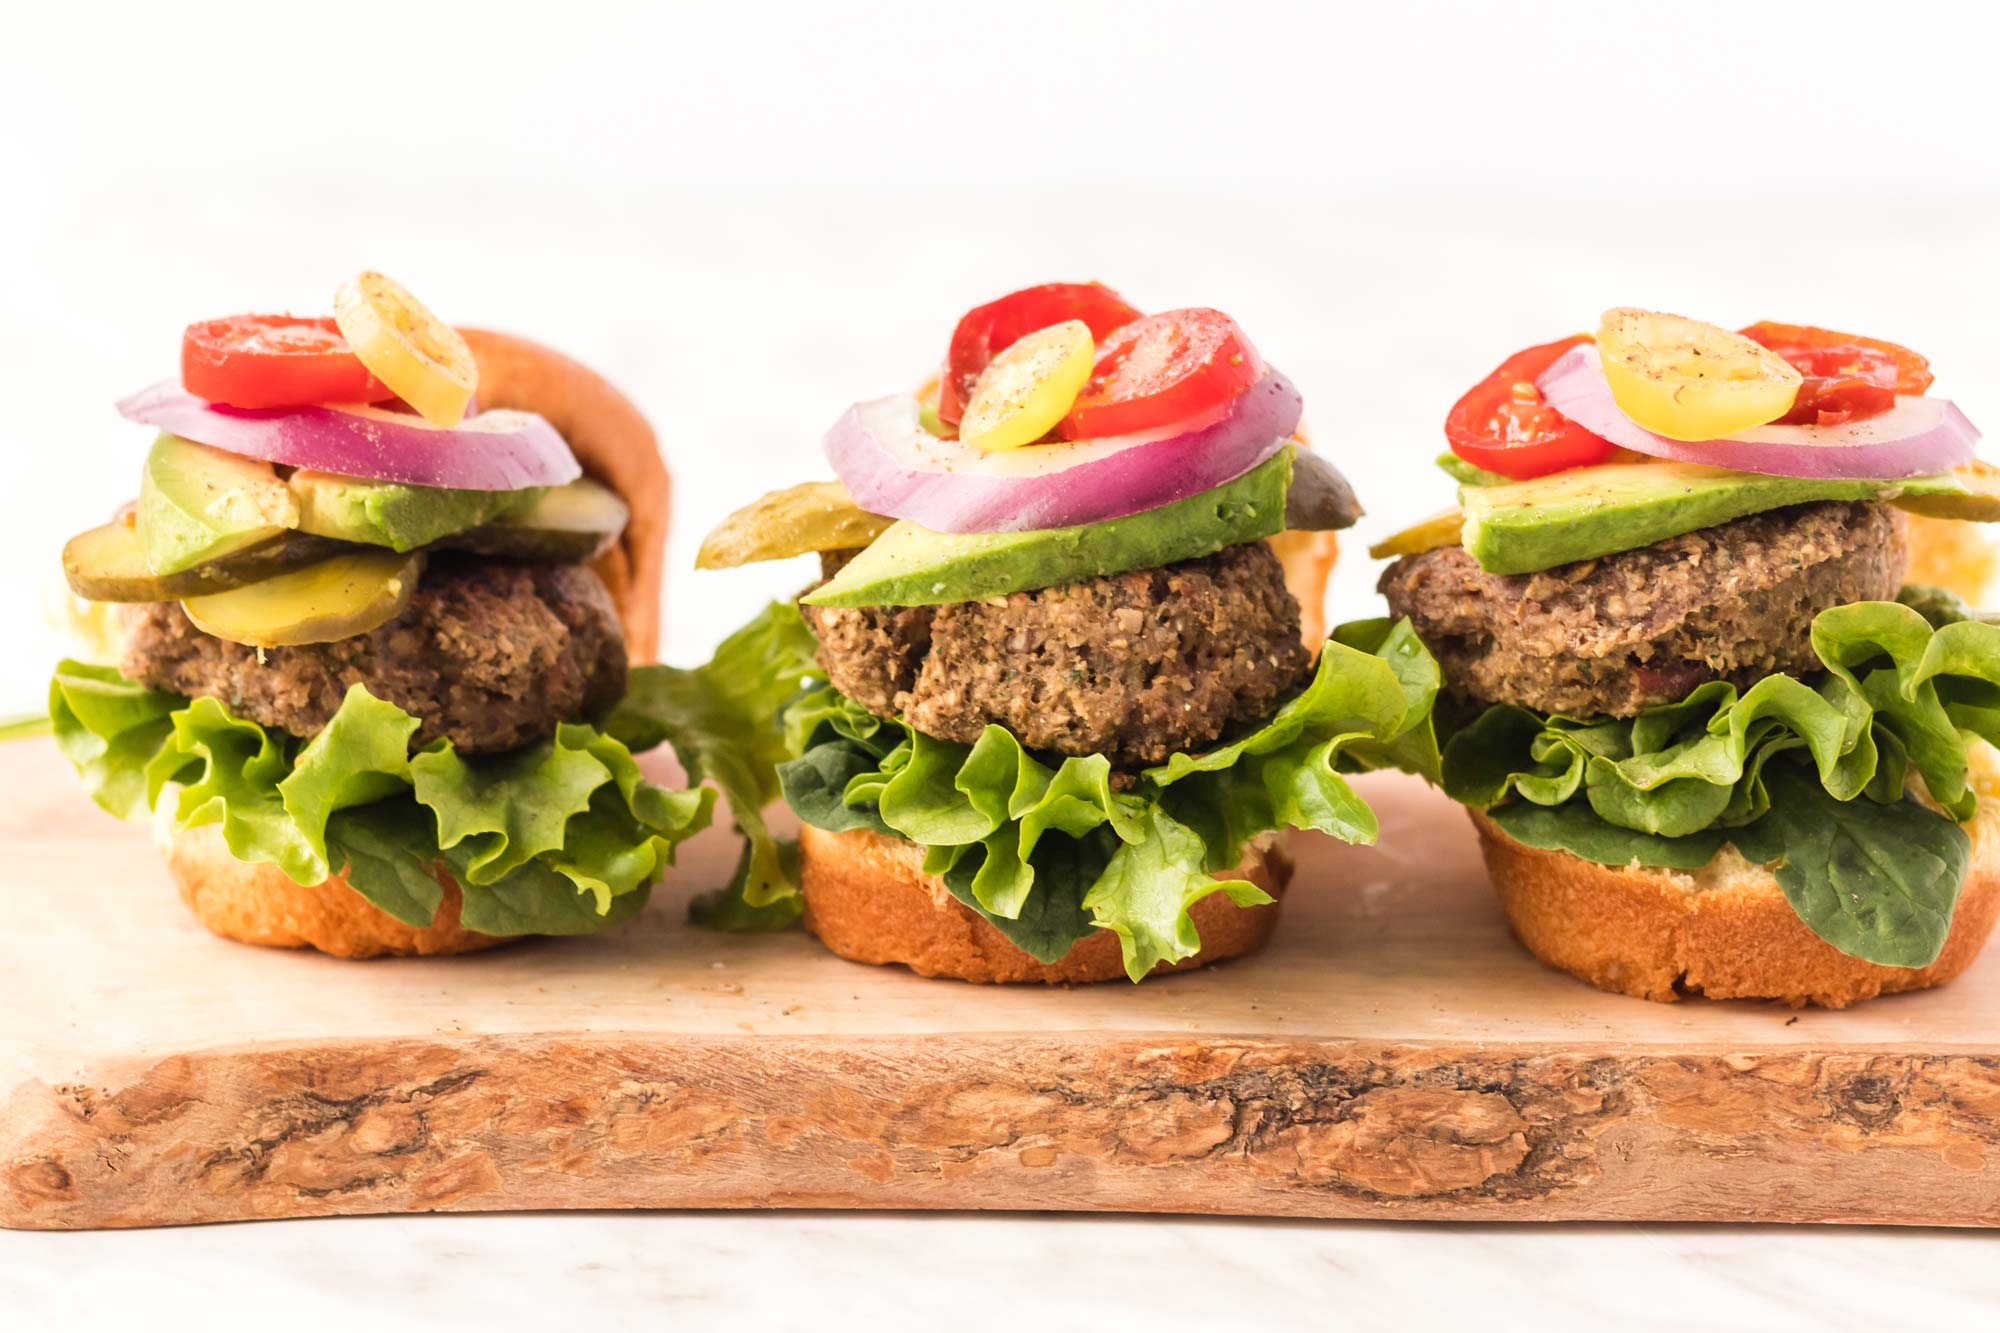 Food combining recipe - Mushroom pecan burgers on cutting board